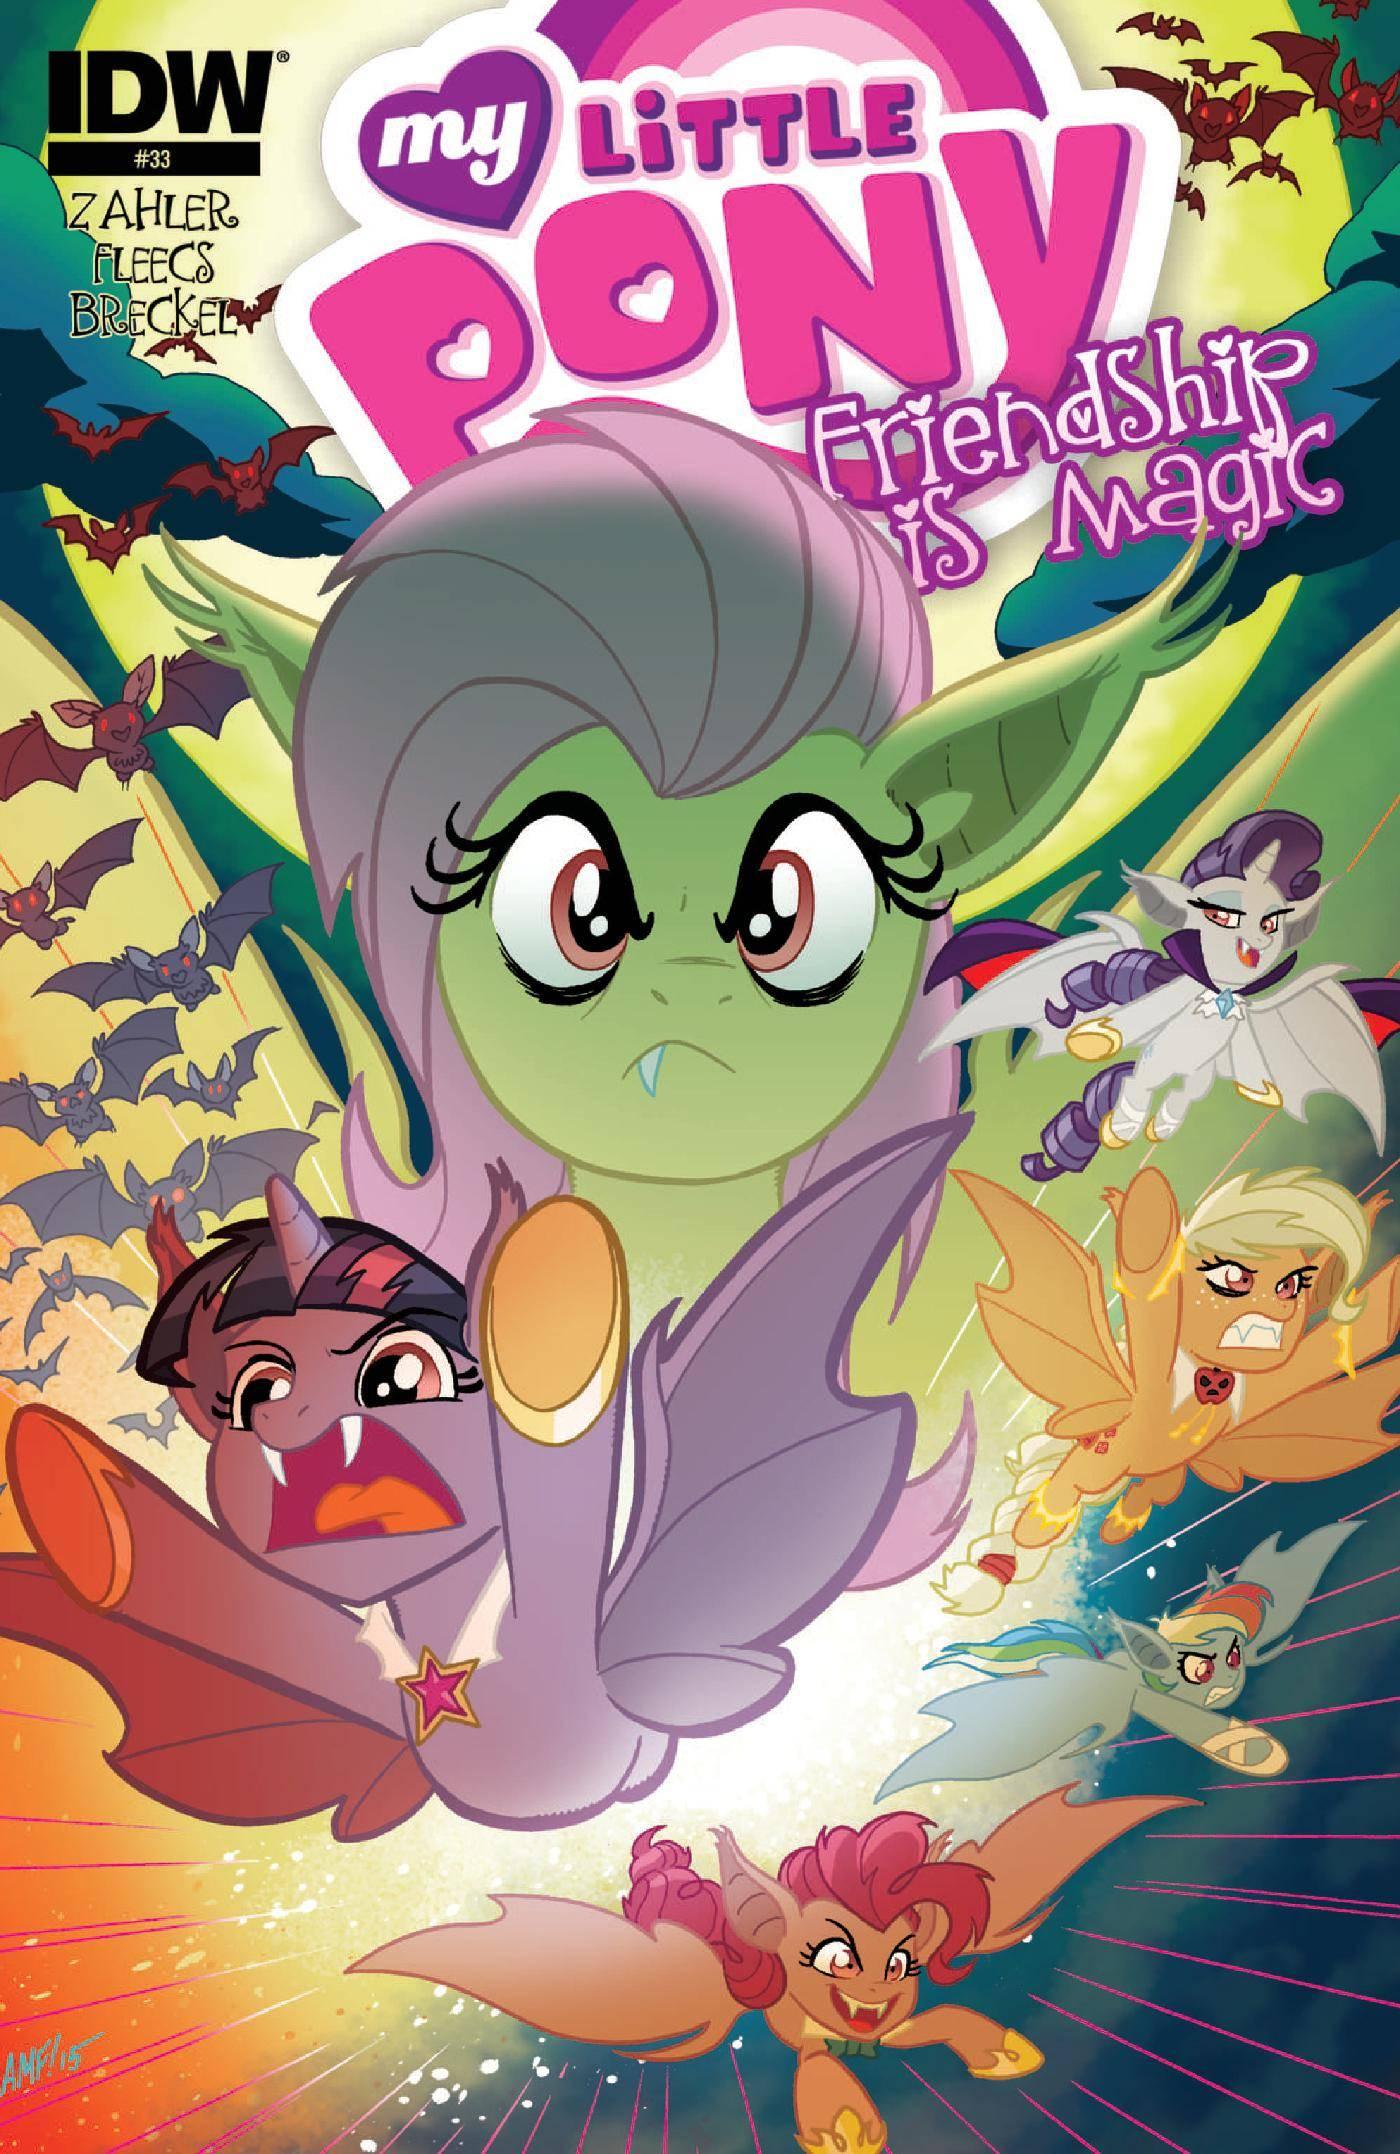 My Little Pony - Friendship Is Magic 033 2015 digital